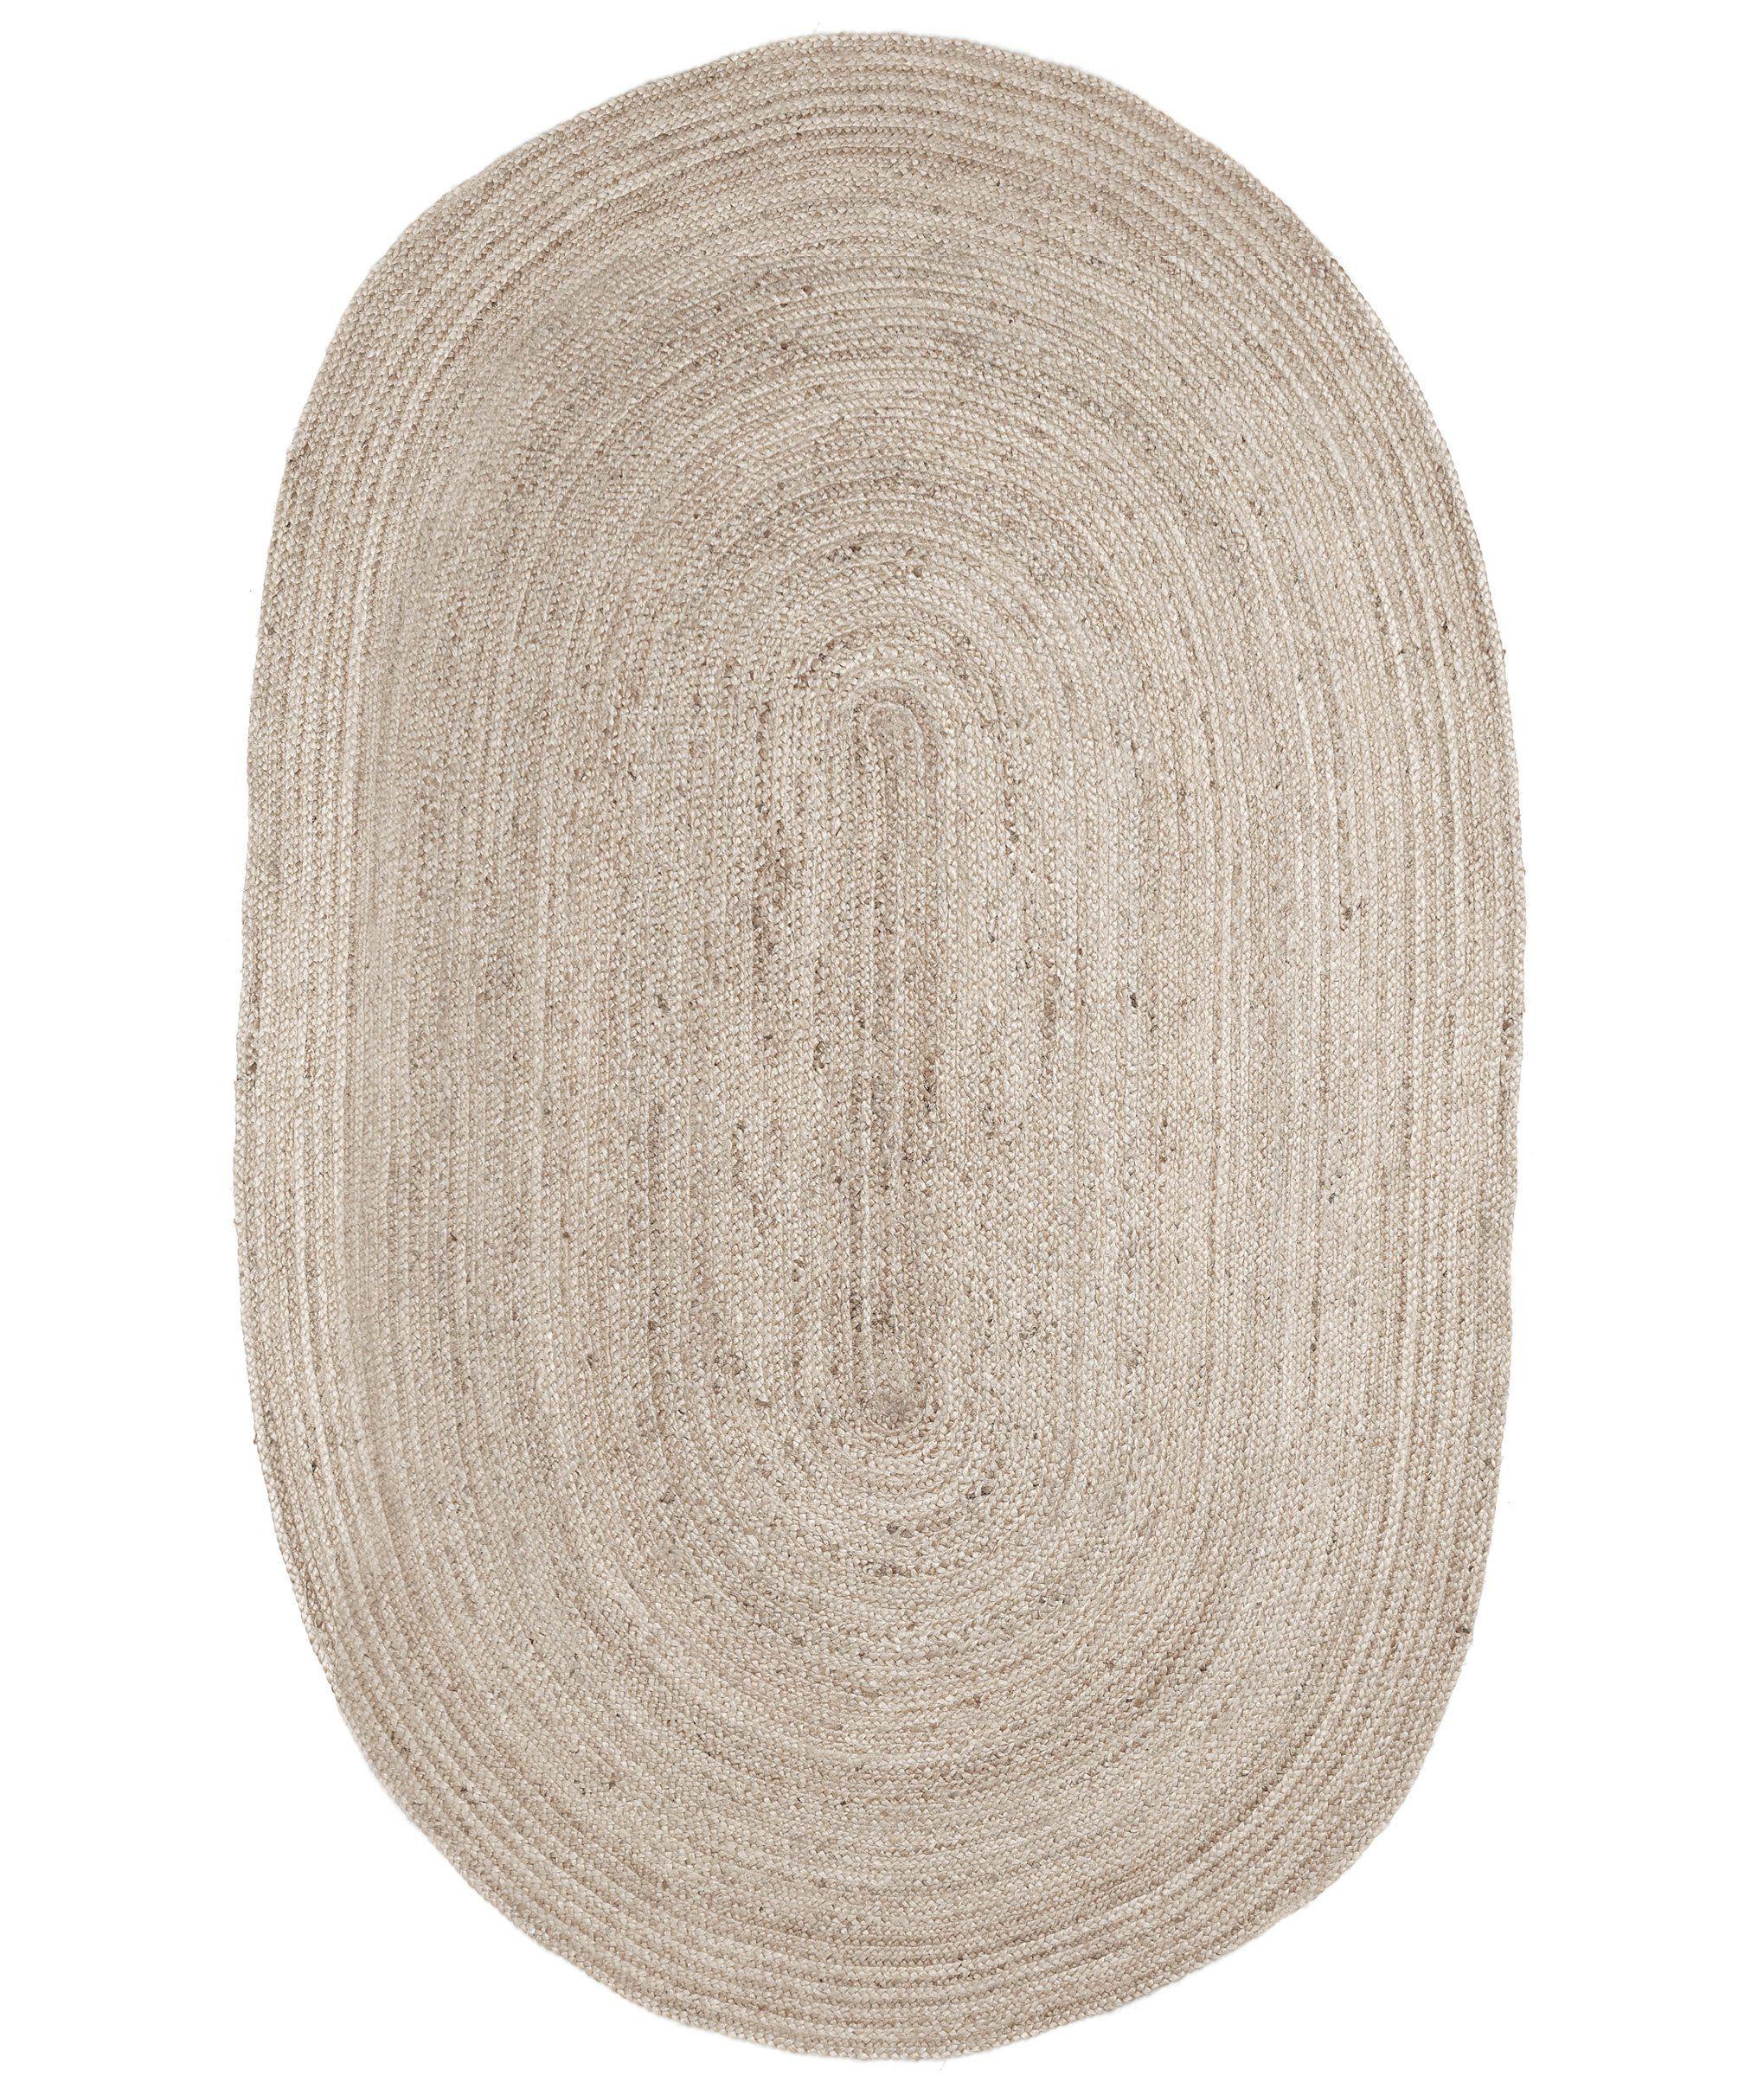 Dutch 6 X 9 Oval Area Rug Oval Area Rug Rugs Rugs On Carpet